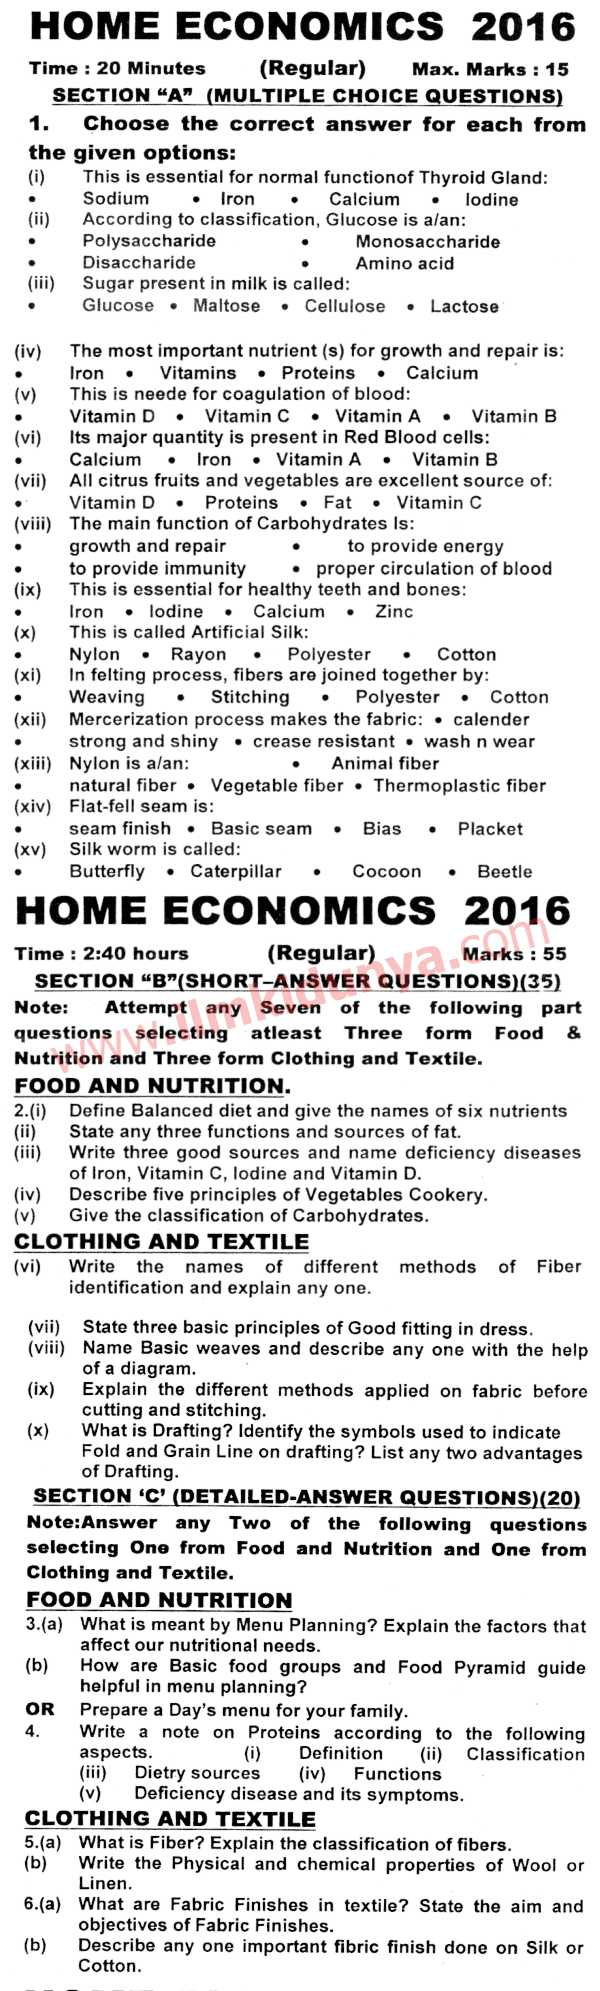 aqa home economics past papers Aqa-2140-w-trb-cexwecon2pdf aqa-2140-w-trb-cexwecon4pdf  aqa-ec0n1-w-qp-jan09pdf.